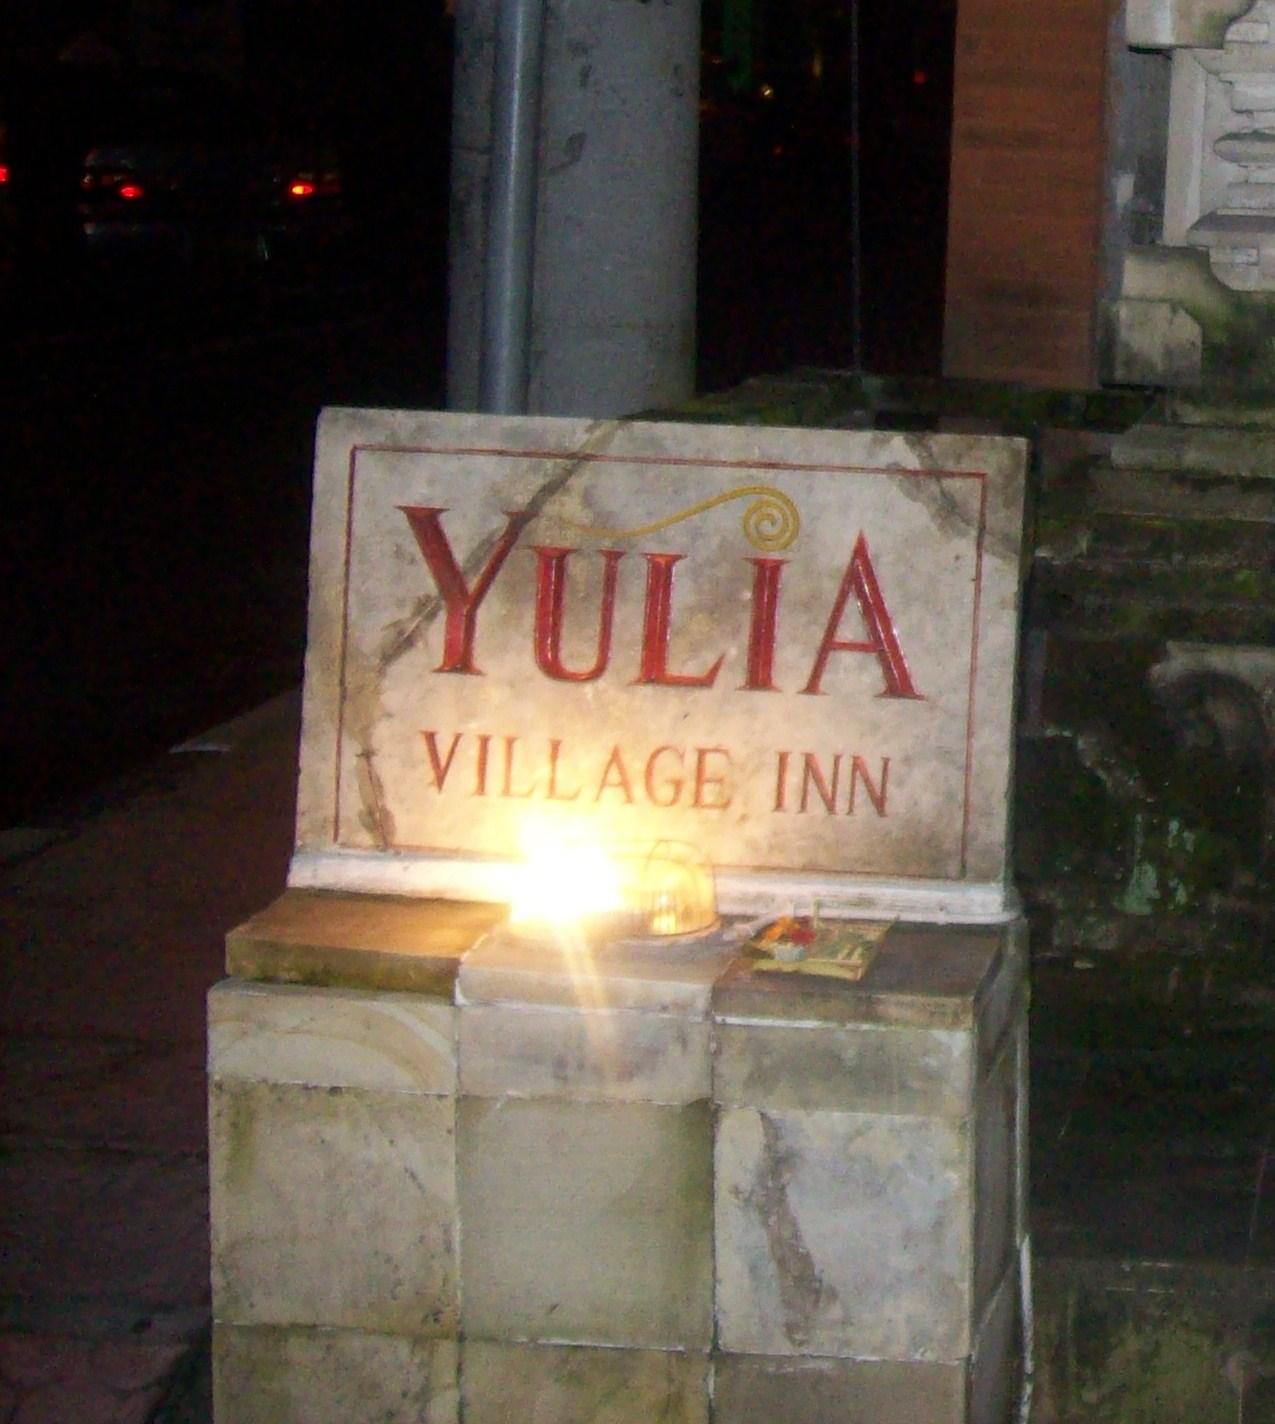 Yulia village inn